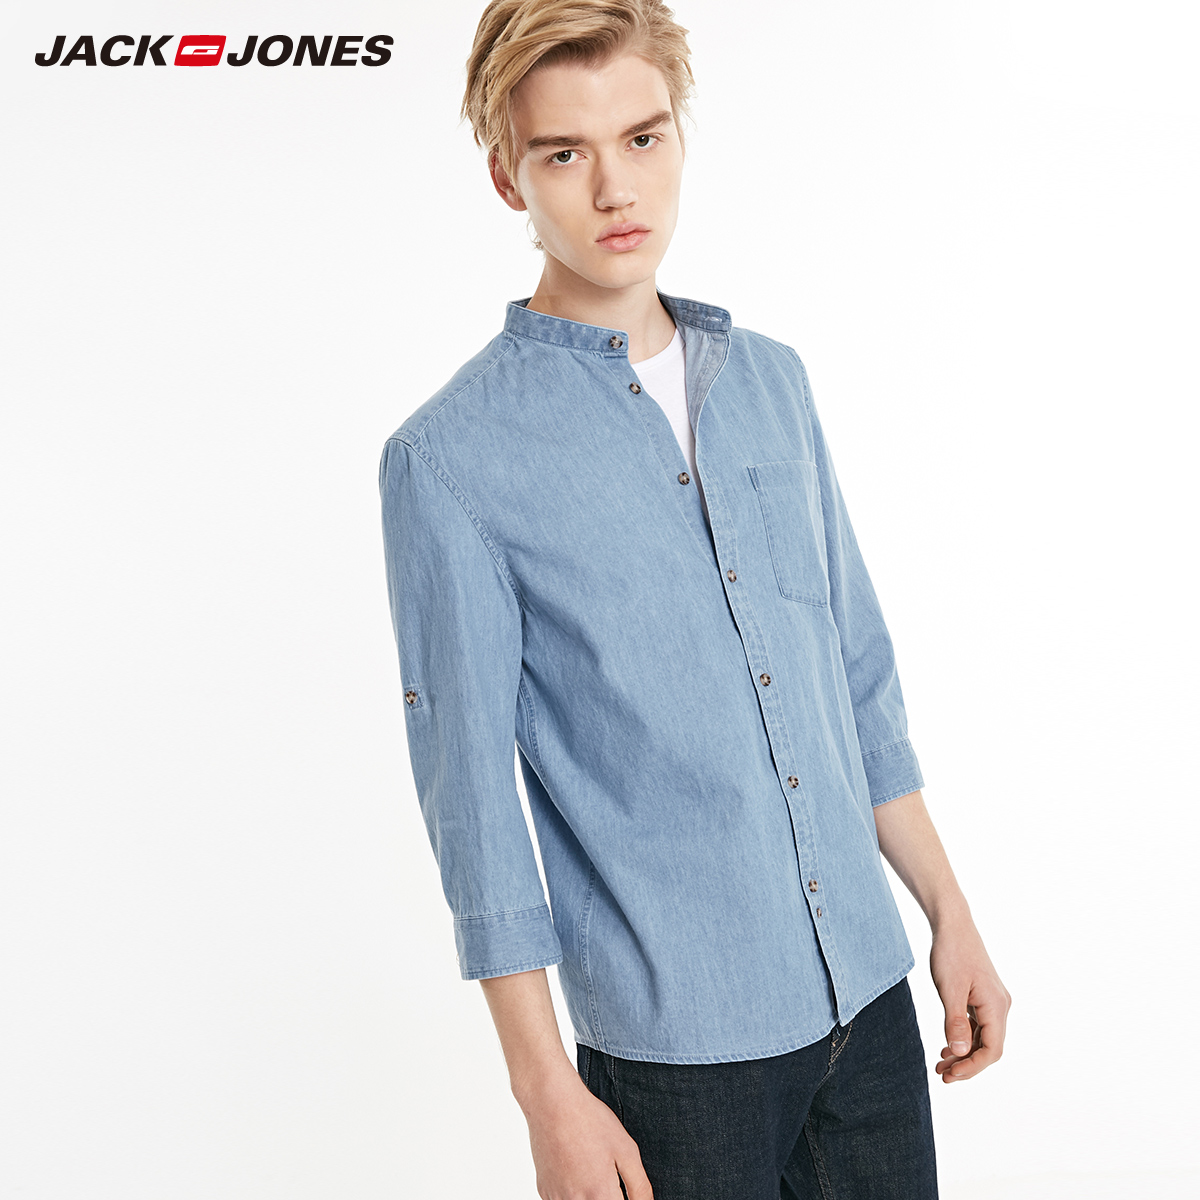 JackJones Men's 100% Cotton Stand-up Collar 3/4 Sleeves Denim Shirt Menswear  219231512